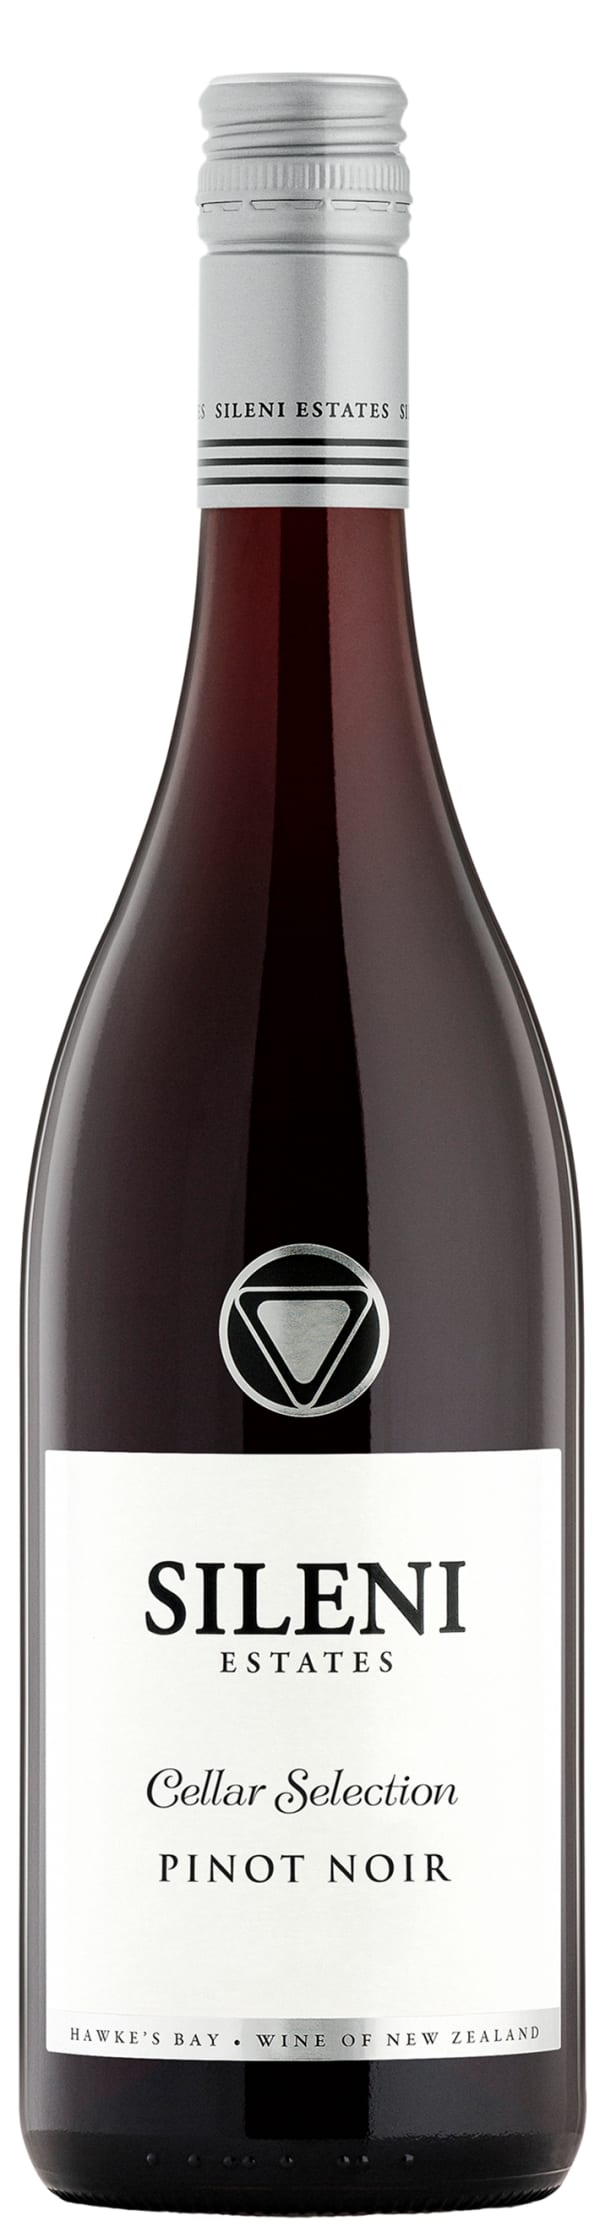 Sileni Cellar Selection Pinot Noir 2016